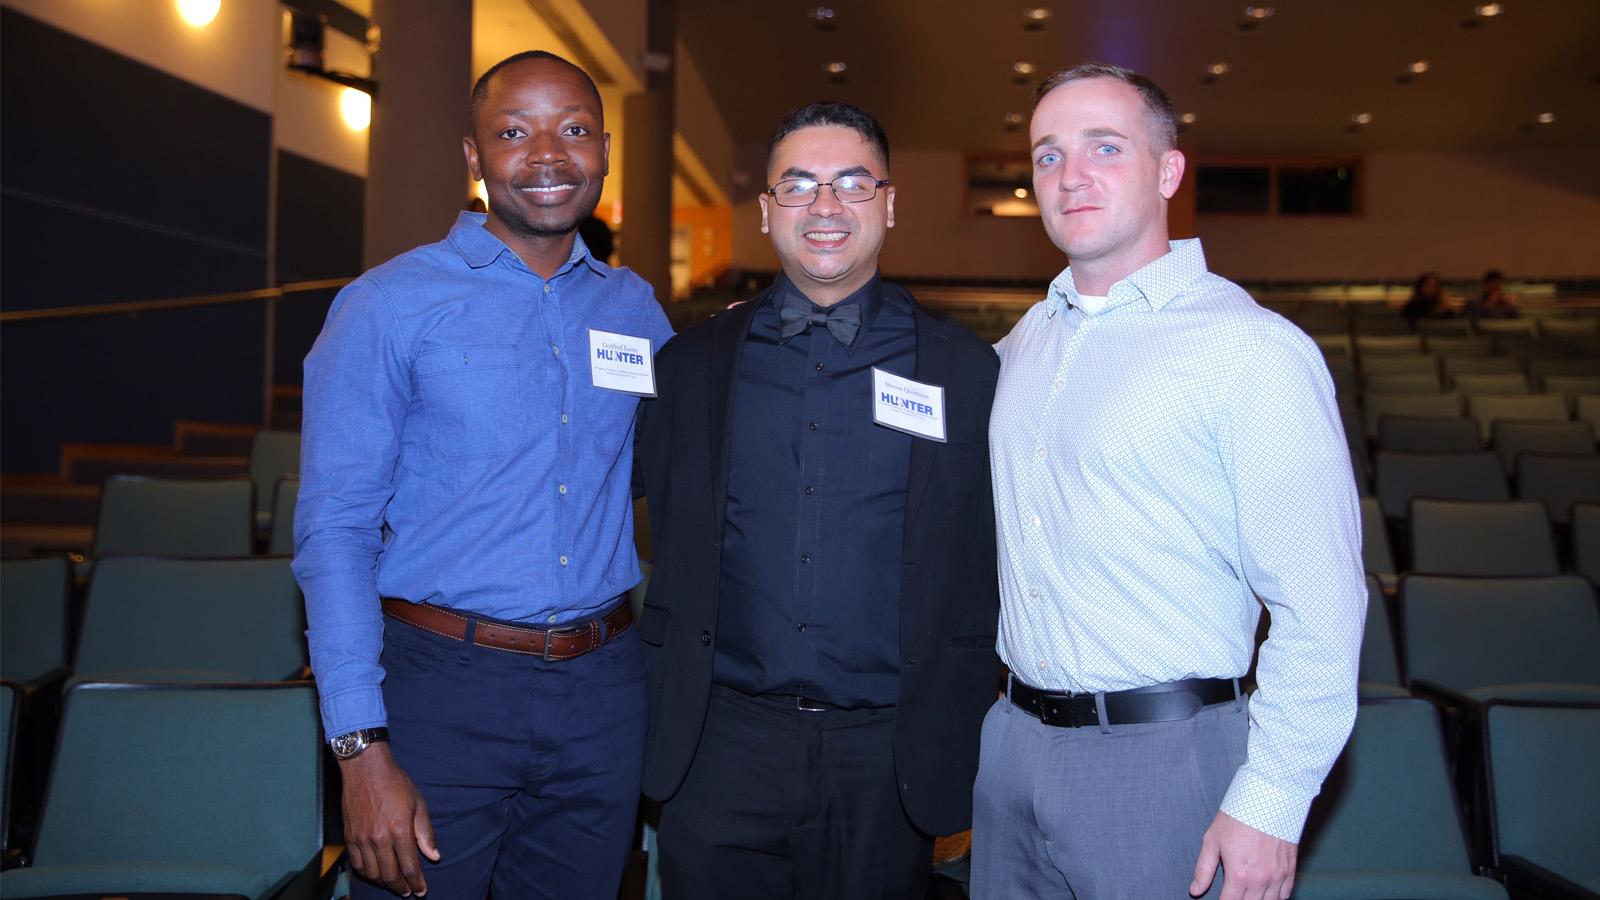 Hunter Student Veterans: Godfred Essim, Steven Quintana, and Thomas Joy